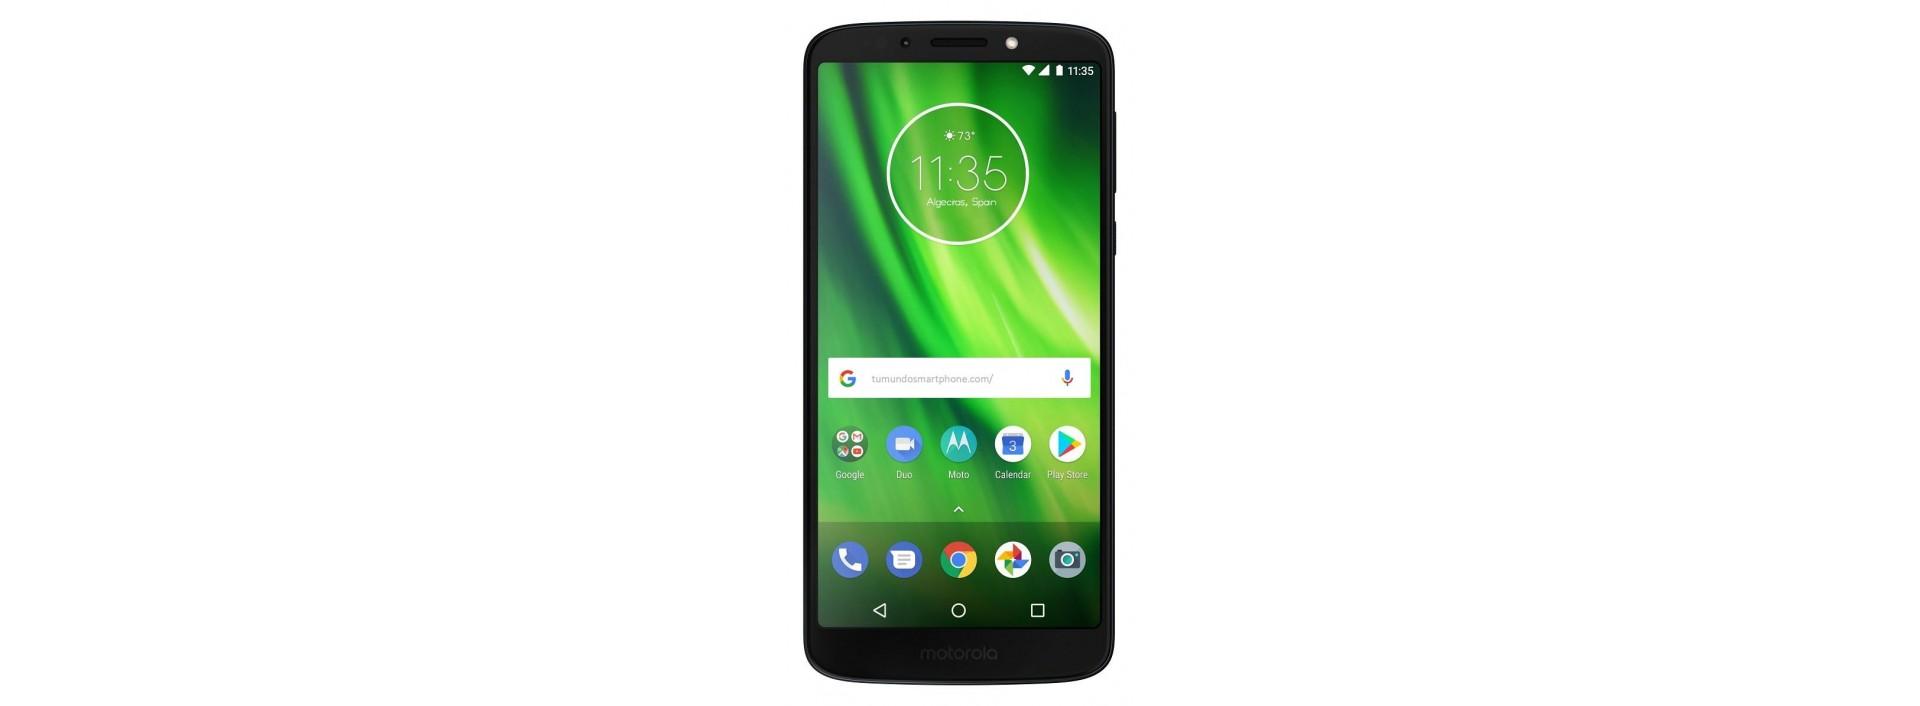 Funda para Moto G6 Play